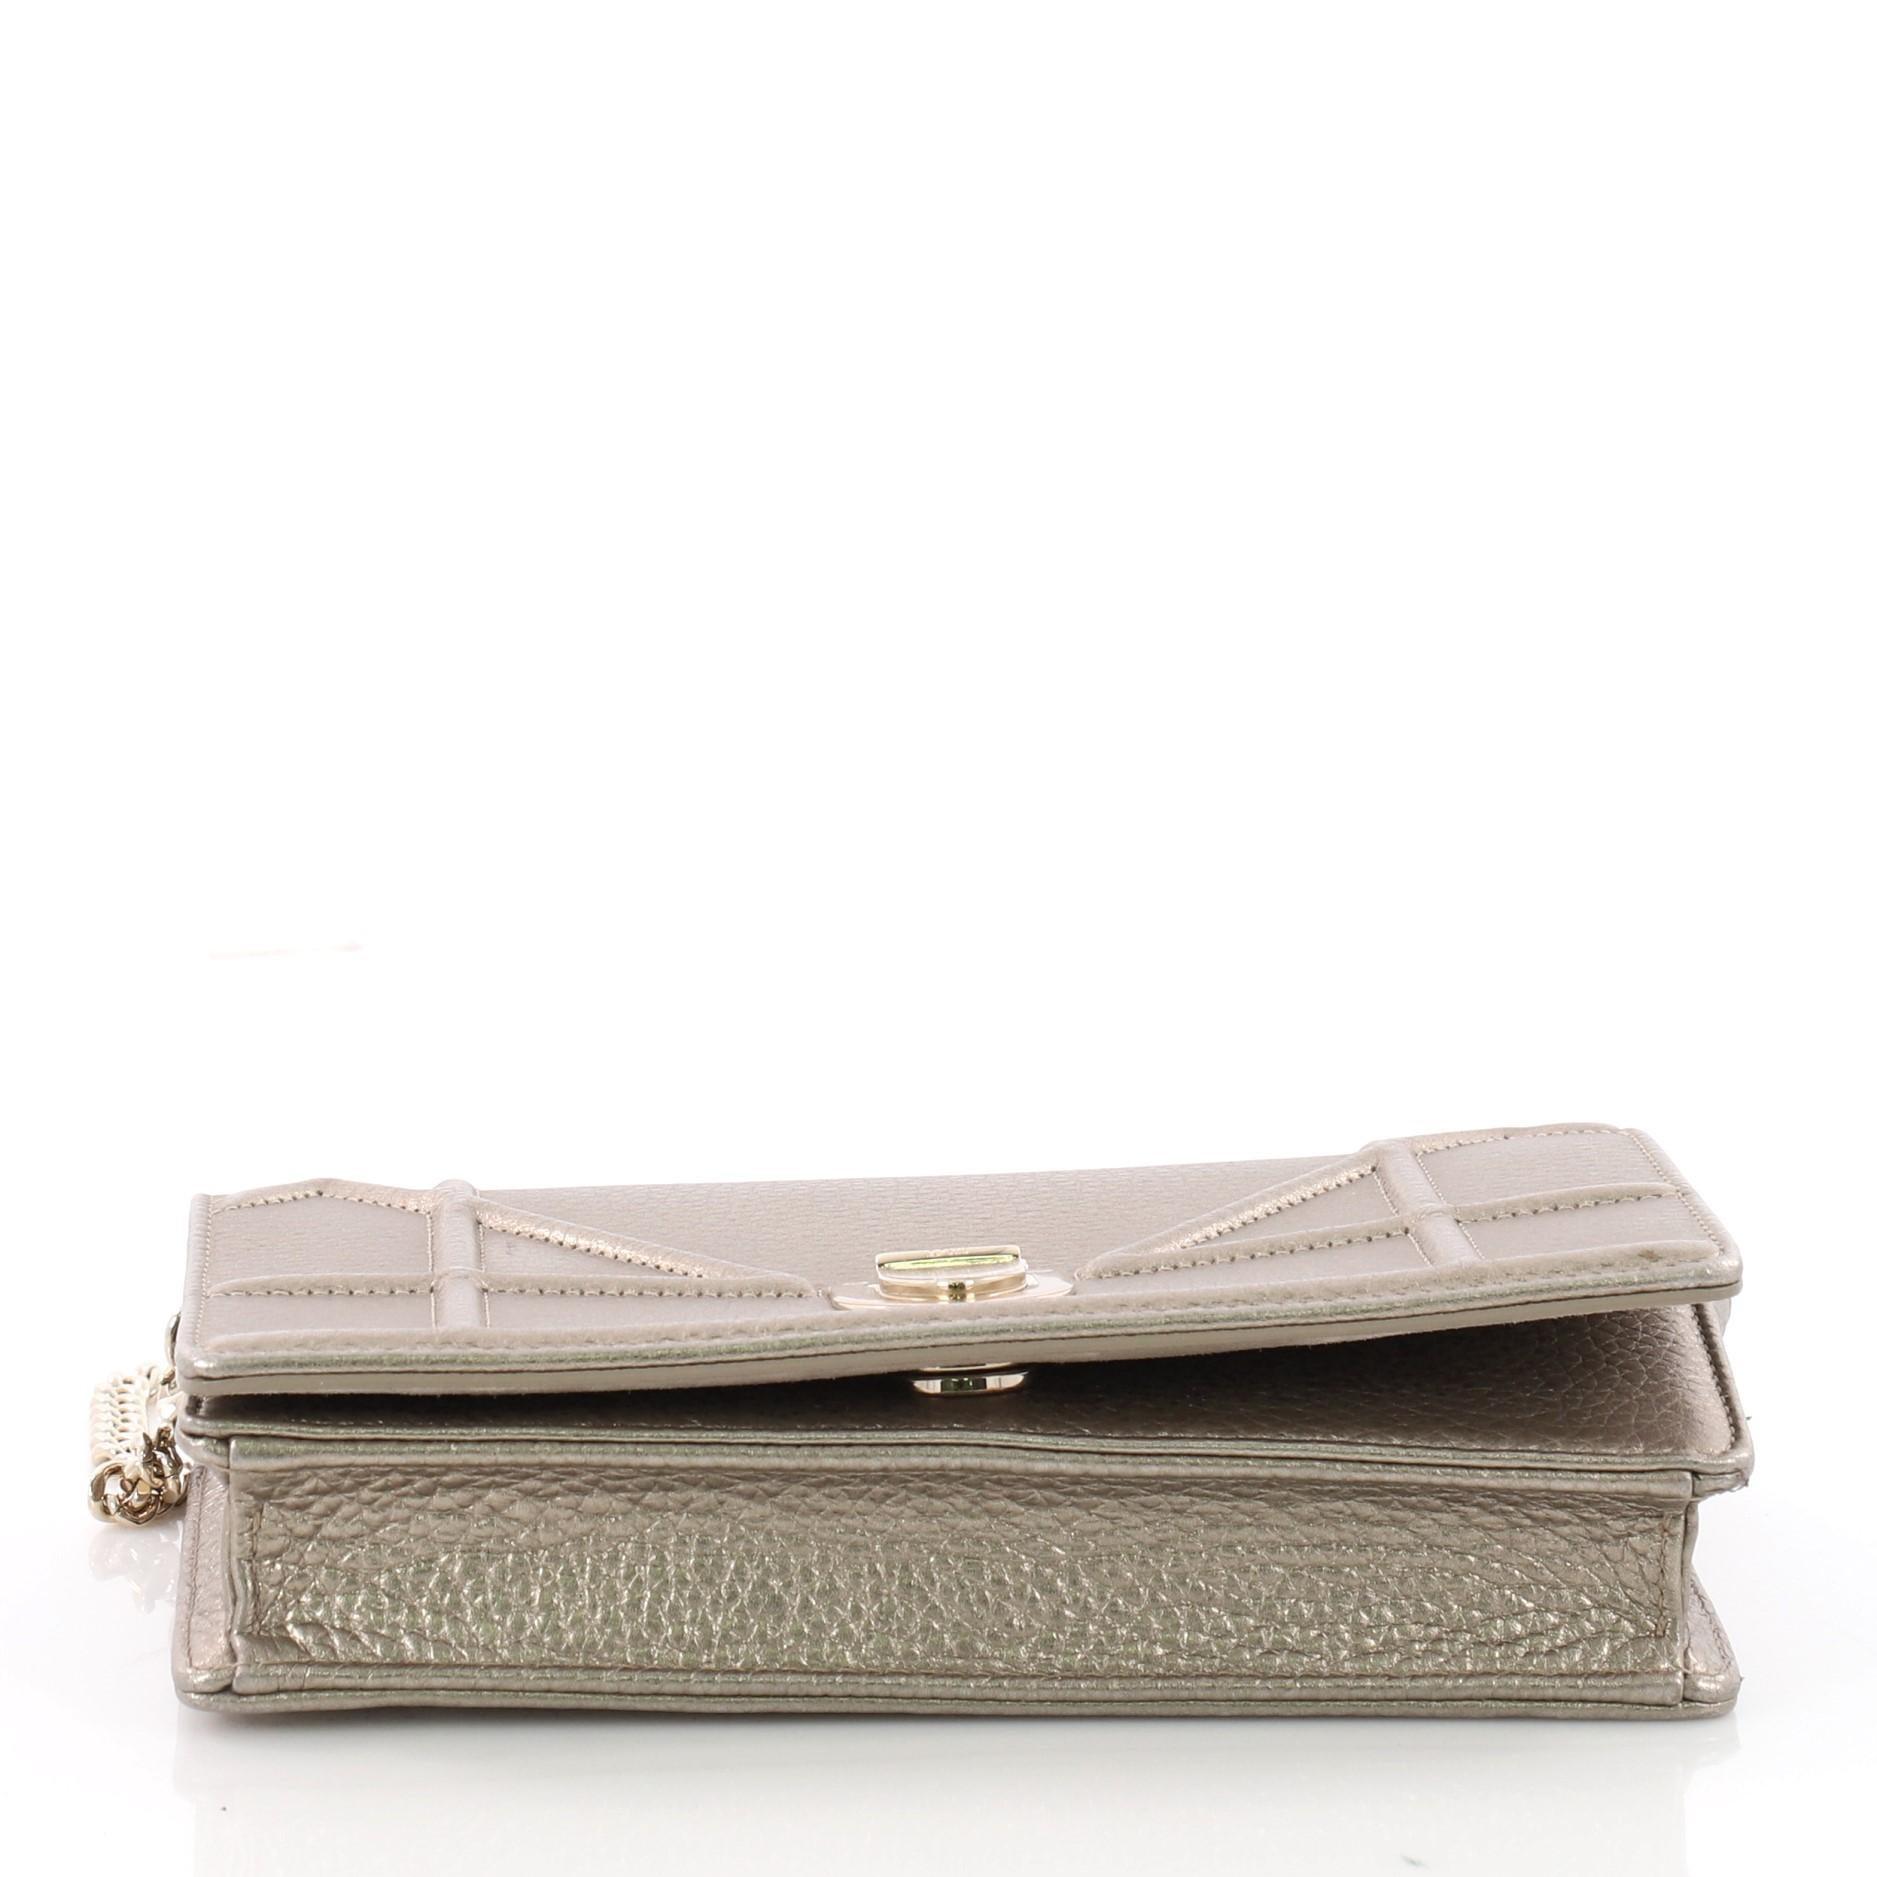 0acbd75322b11 Christian Dior Diorama Leder-Geldbörse an einer Kette bei 1stdibs